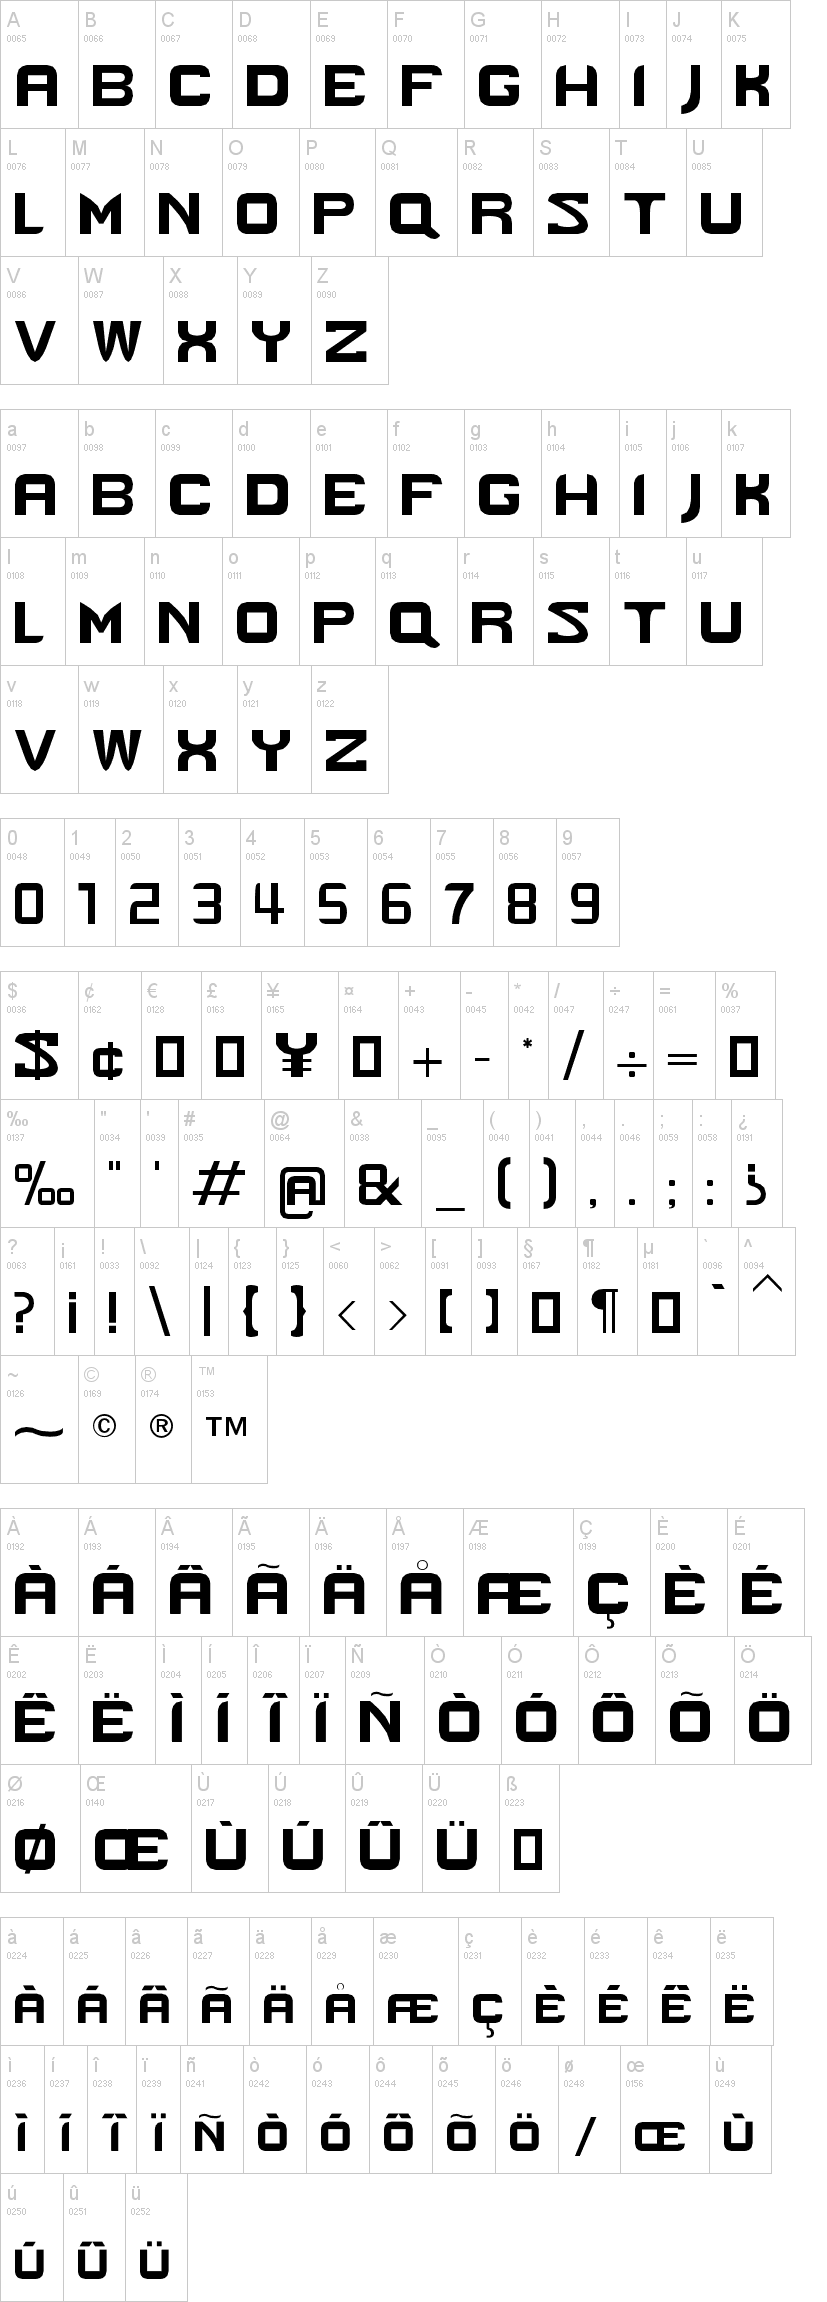 Cyberpunk Is Not Dead Font Dafont Com